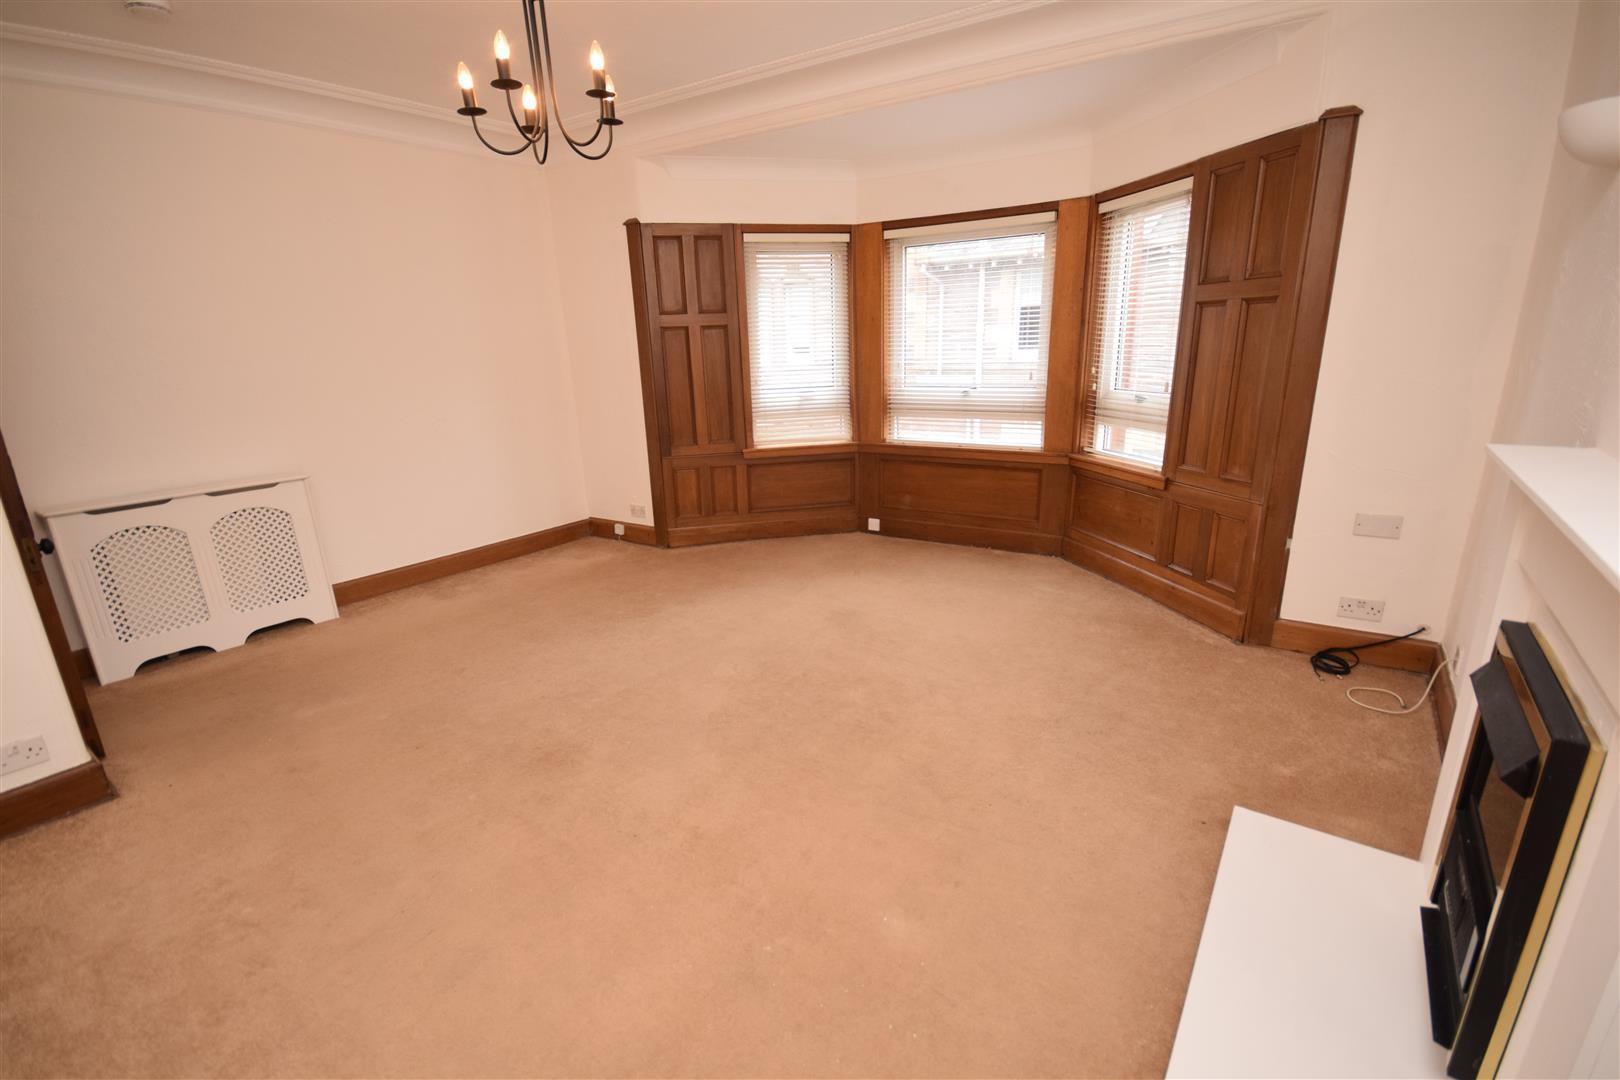 Flat 2, 60, King Street, CRIEFF, Perthshire, PH7 3AX, UK